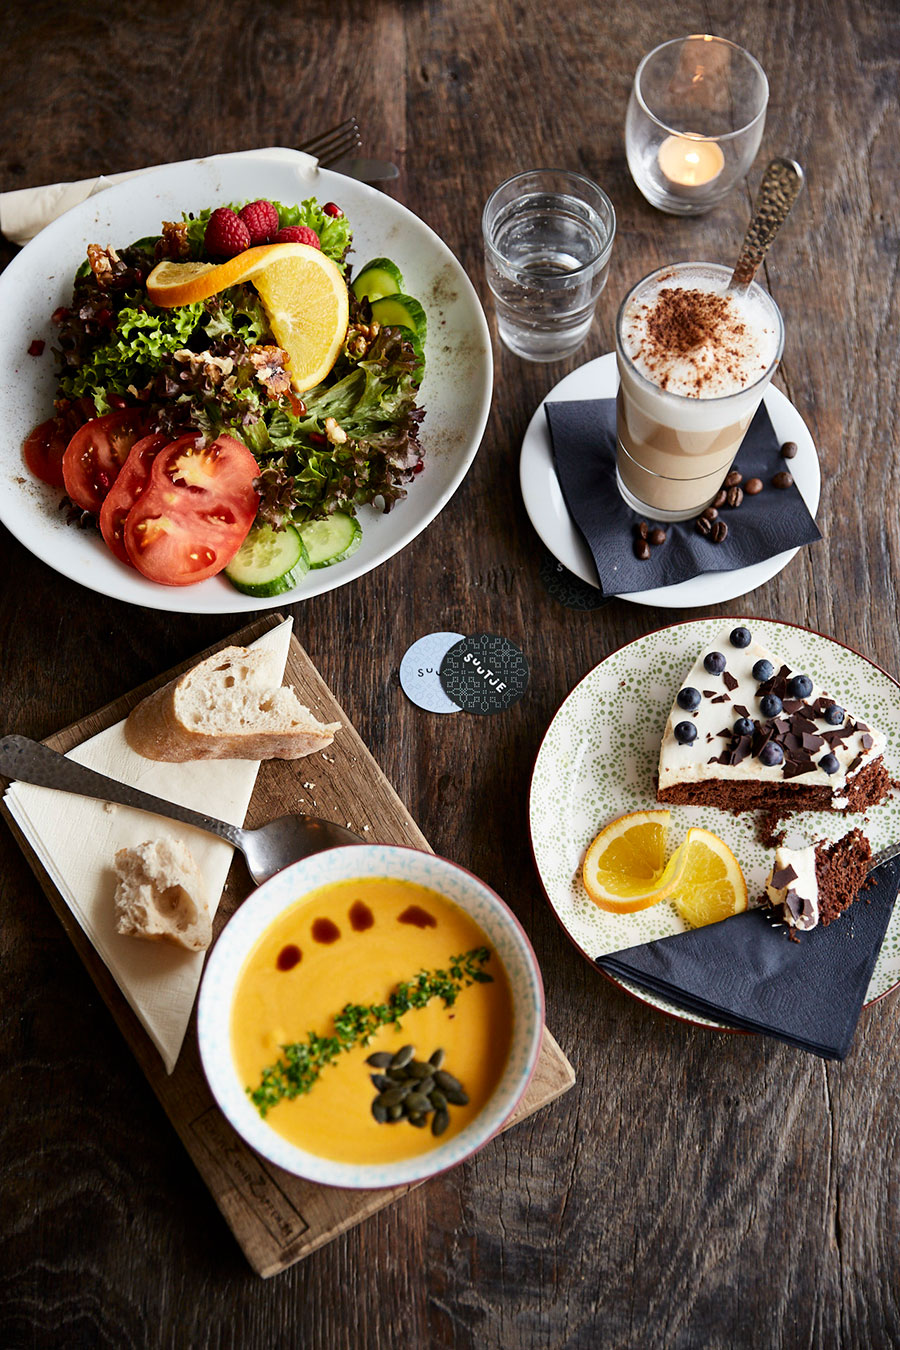 restaurantfotografie-suutje-bielefeld-tablescape